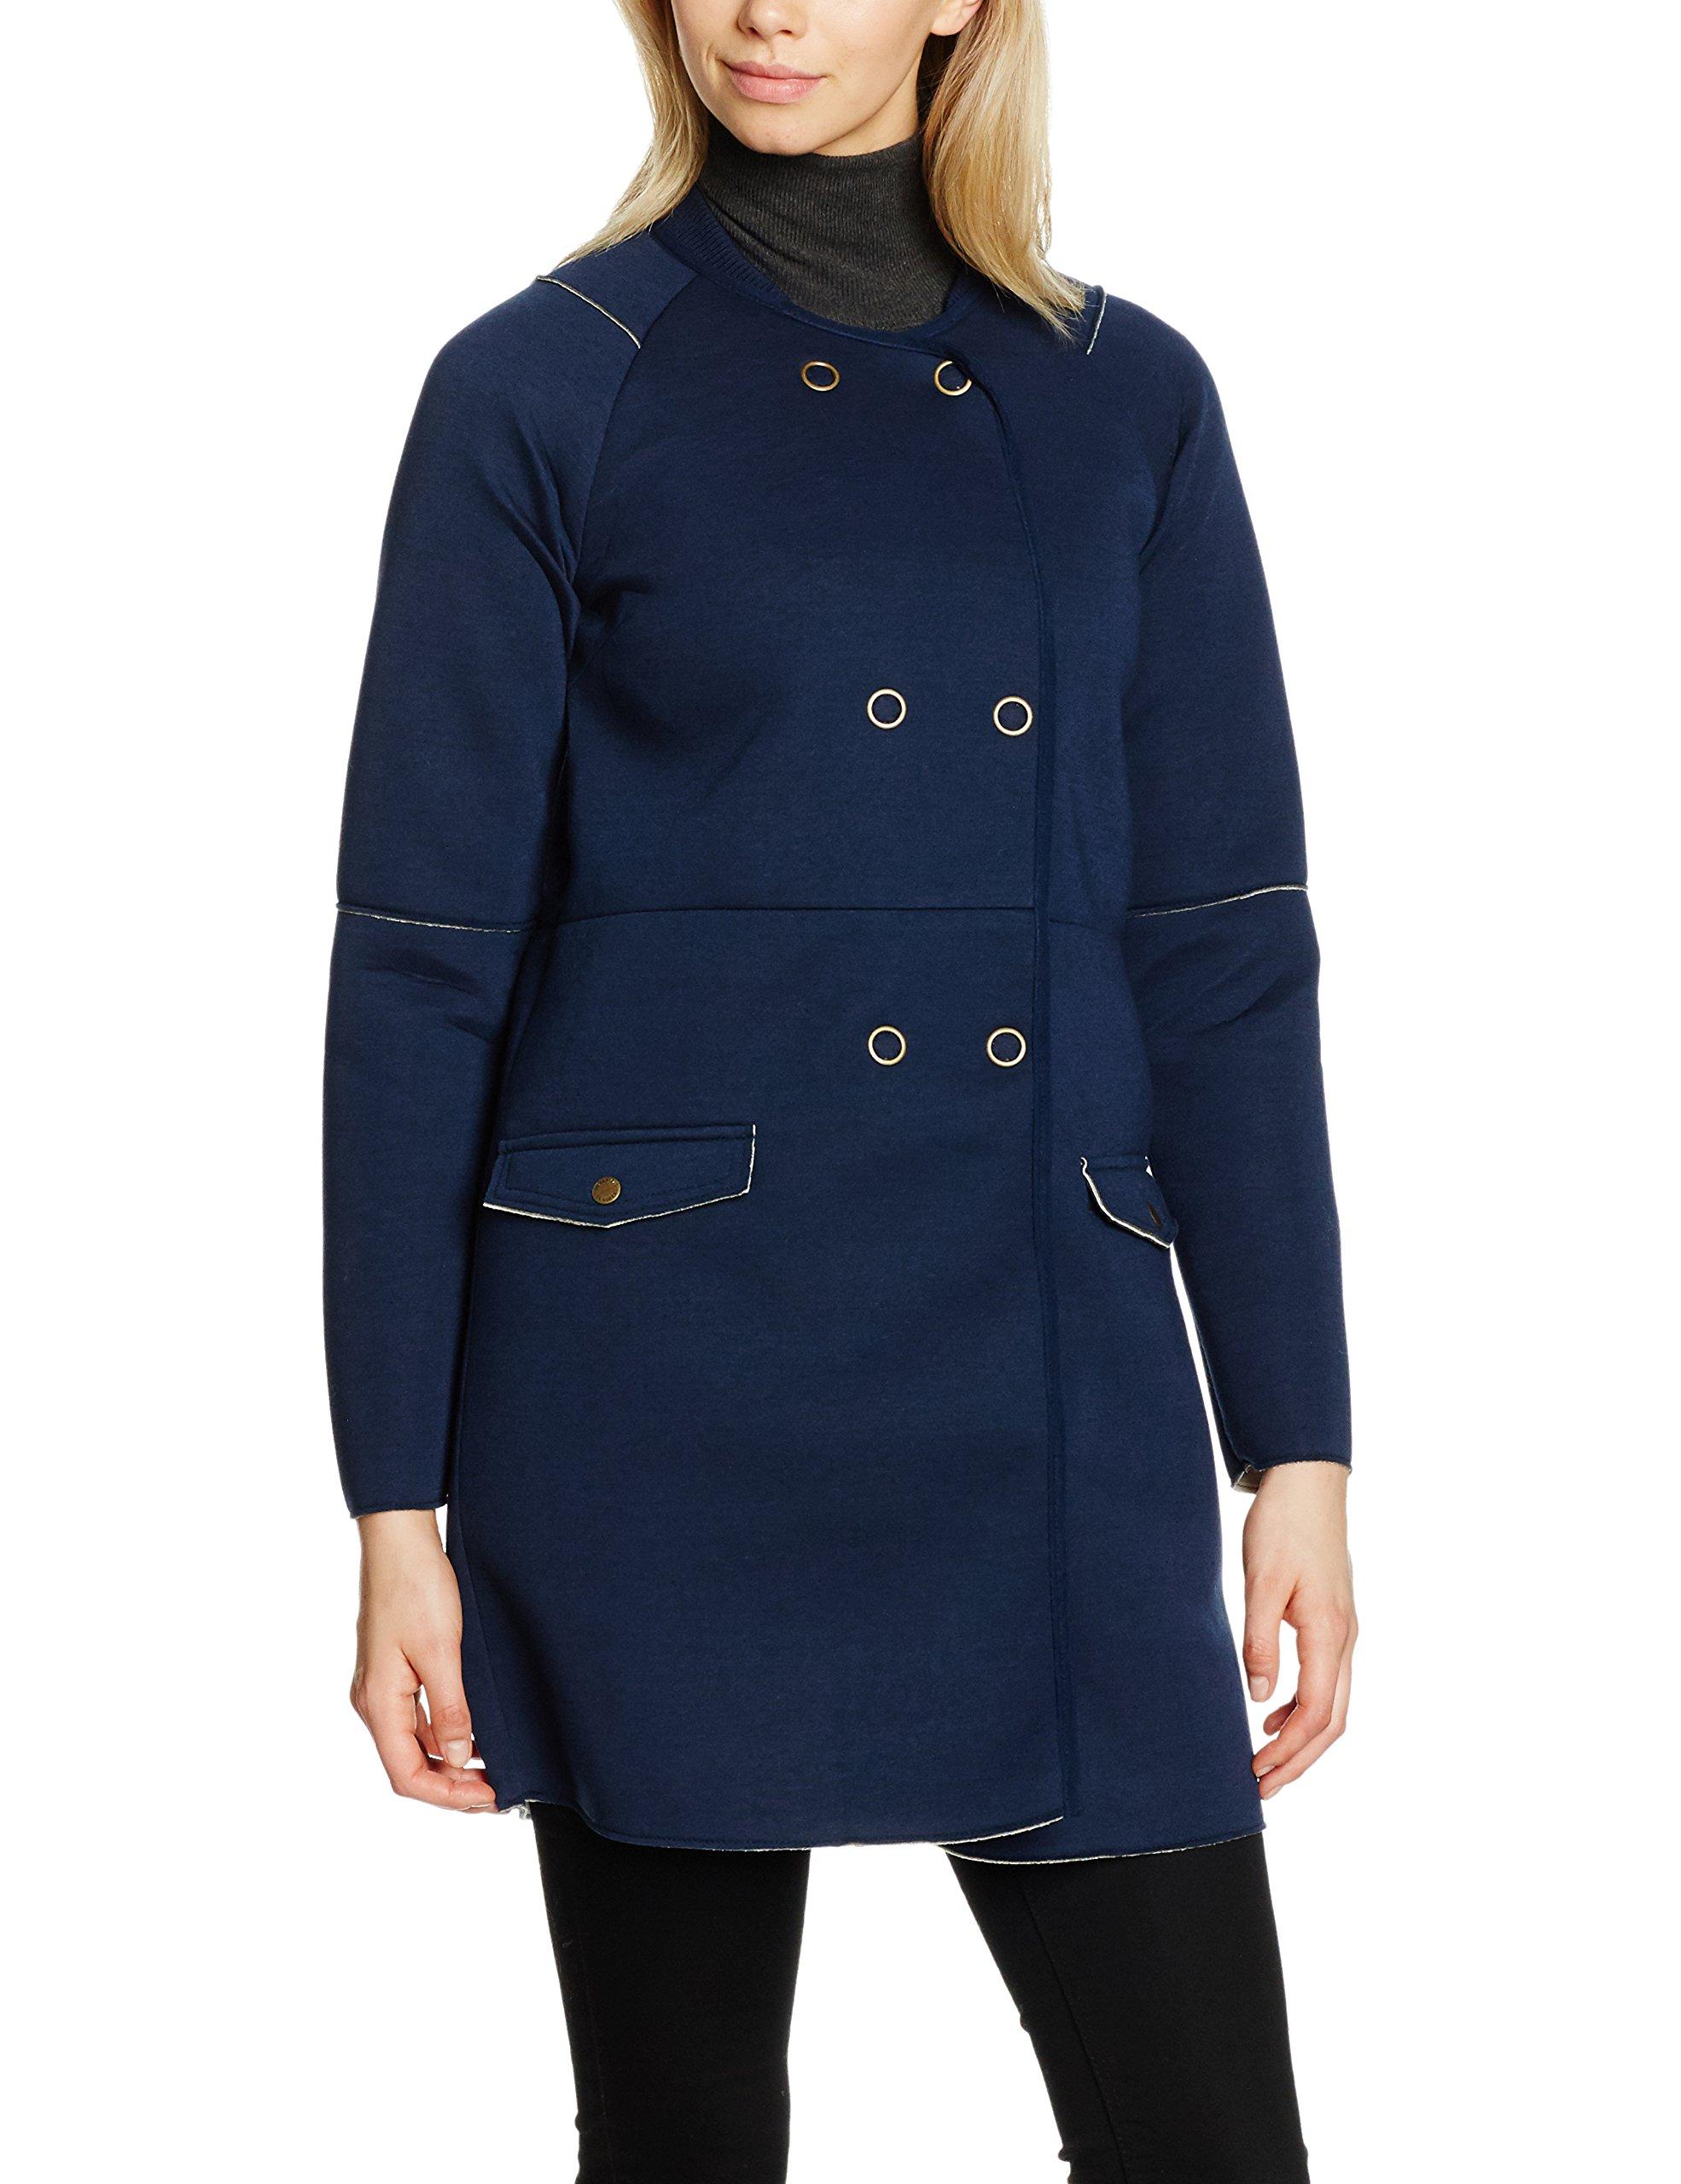 Femme Bleu 44 BellfieldBlouson Duffle Coat ZOPXTiku